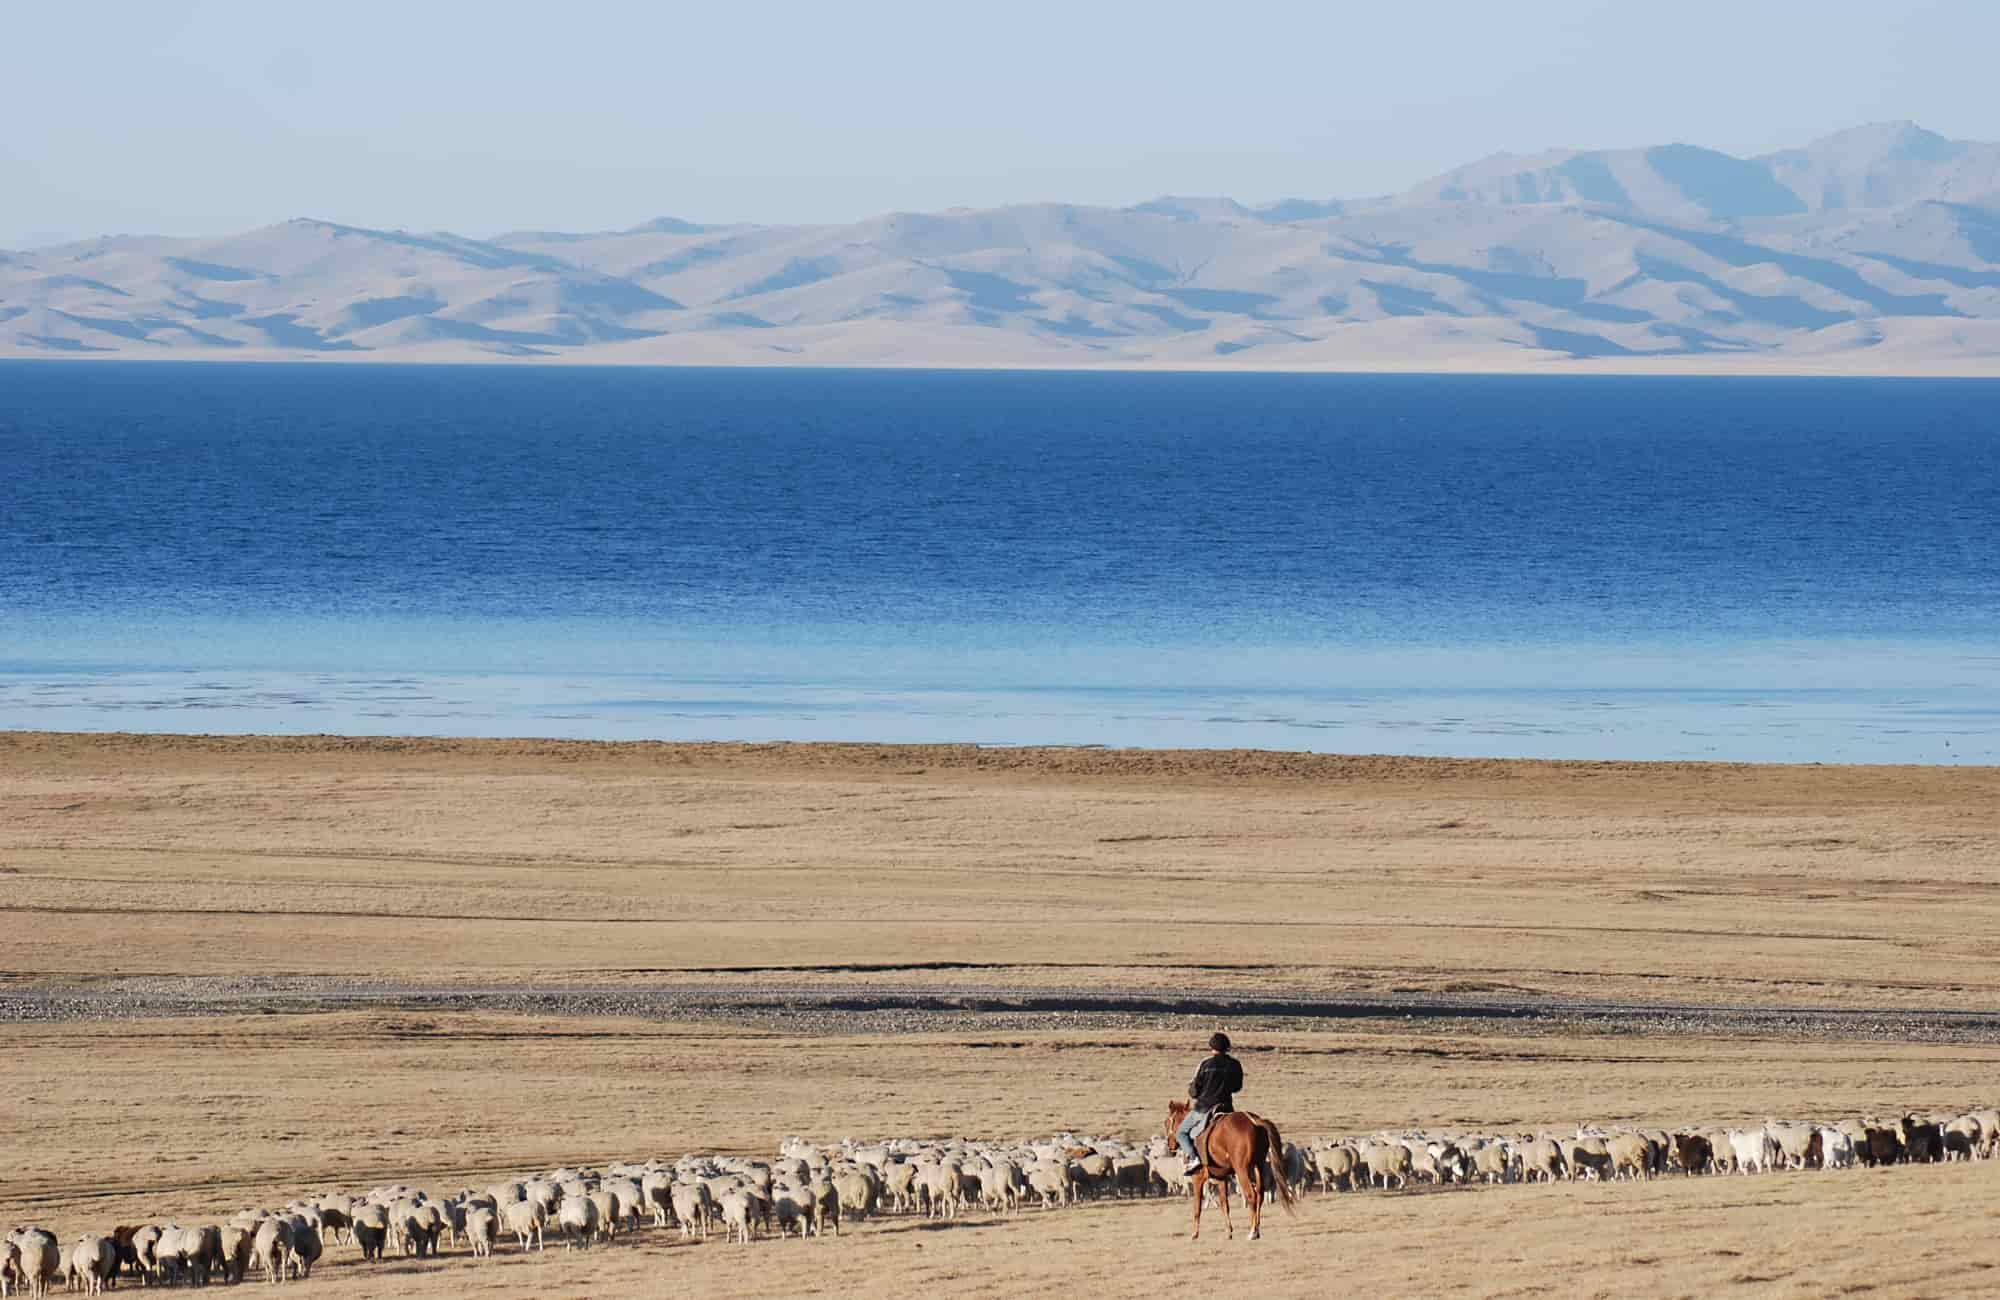 Voyage Kirghizistan - Nomade lac Issyk Kul - Amplitudes